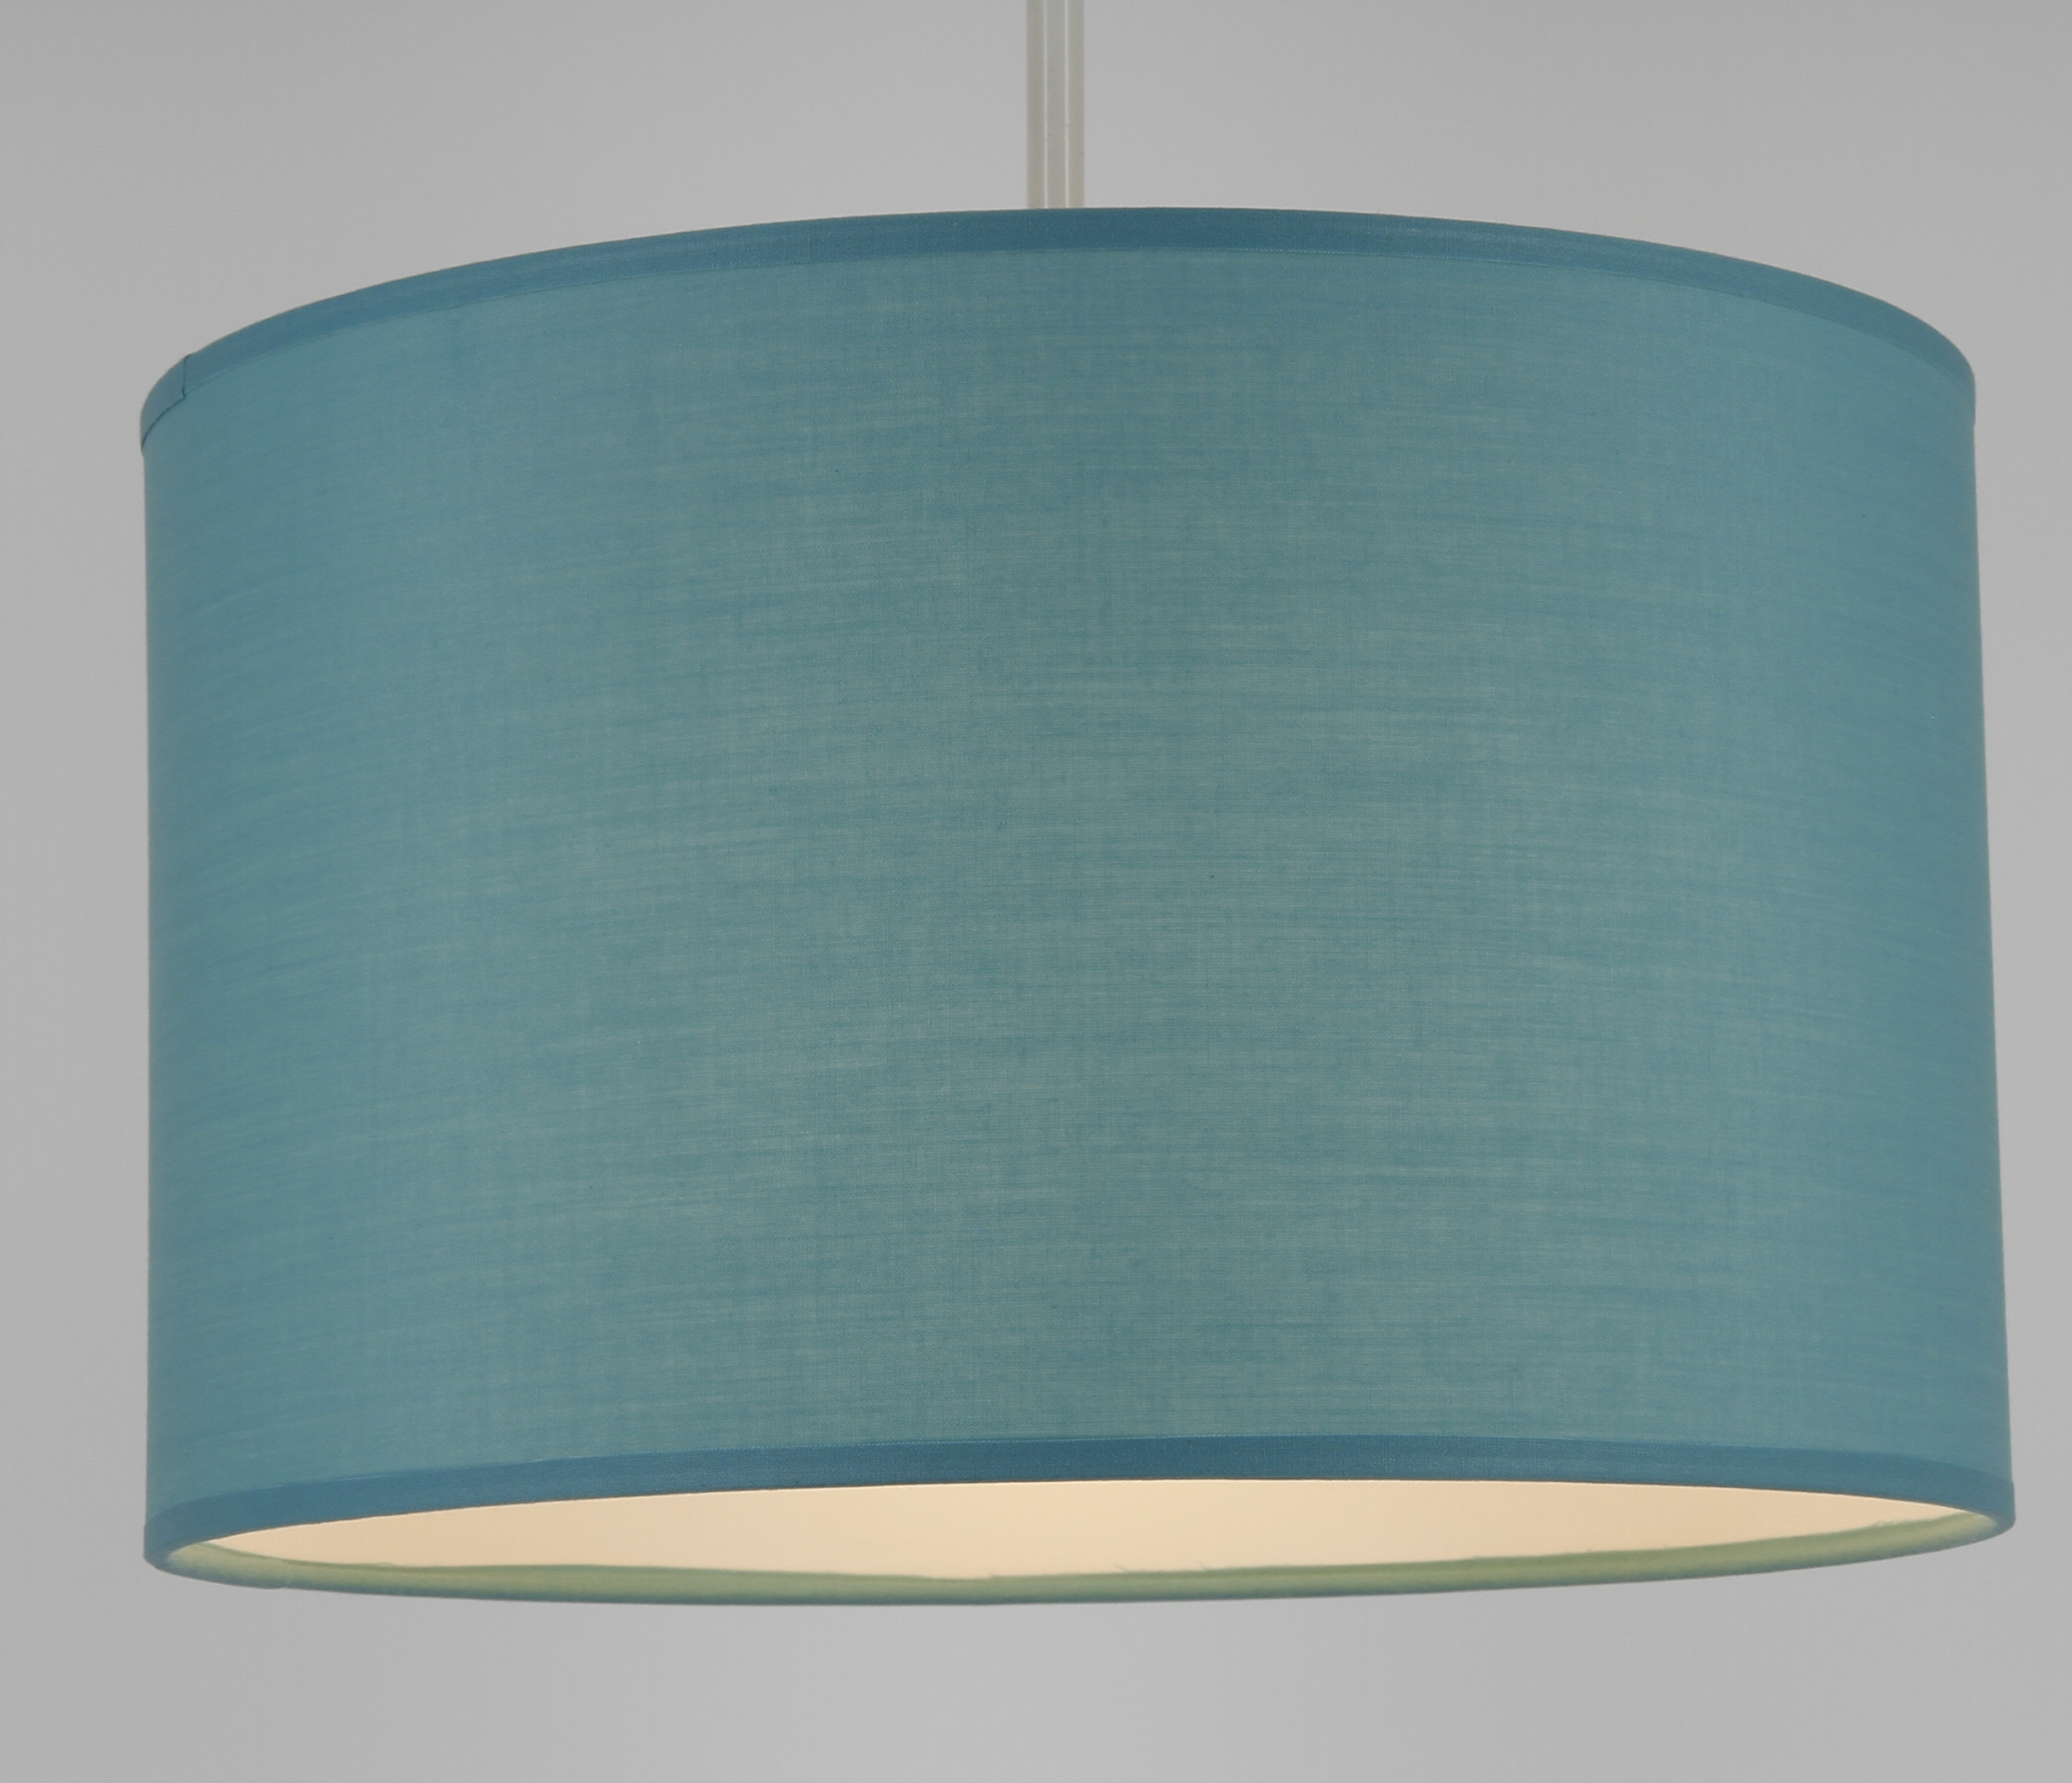 notre coloris bleu lagon actualit s e metropolight. Black Bedroom Furniture Sets. Home Design Ideas